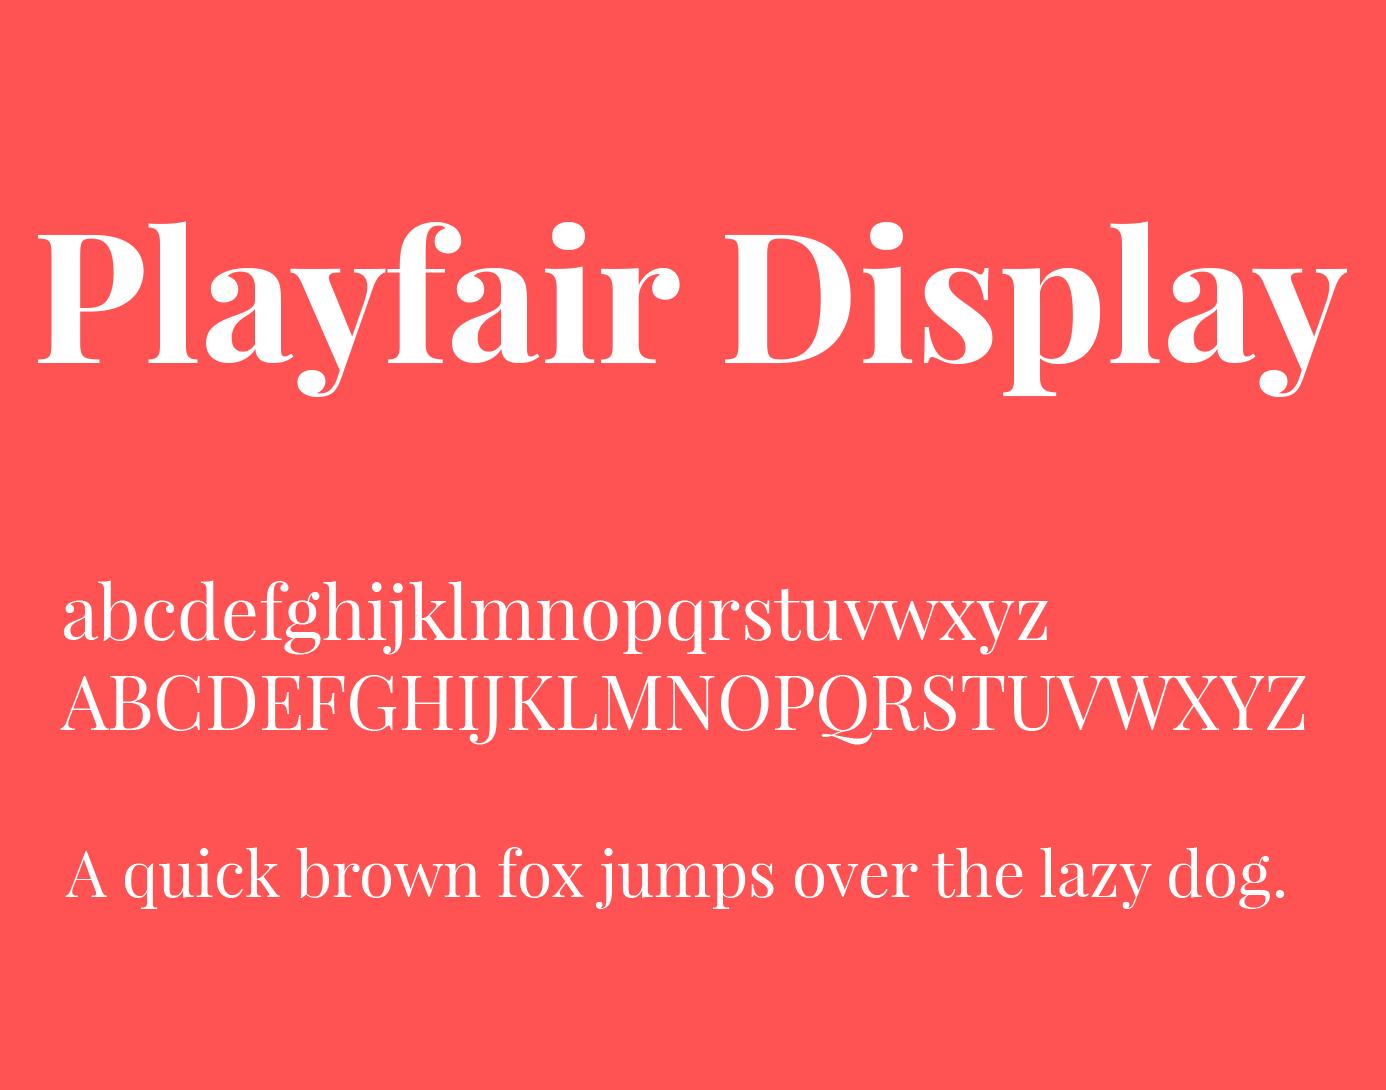 playfair display font type